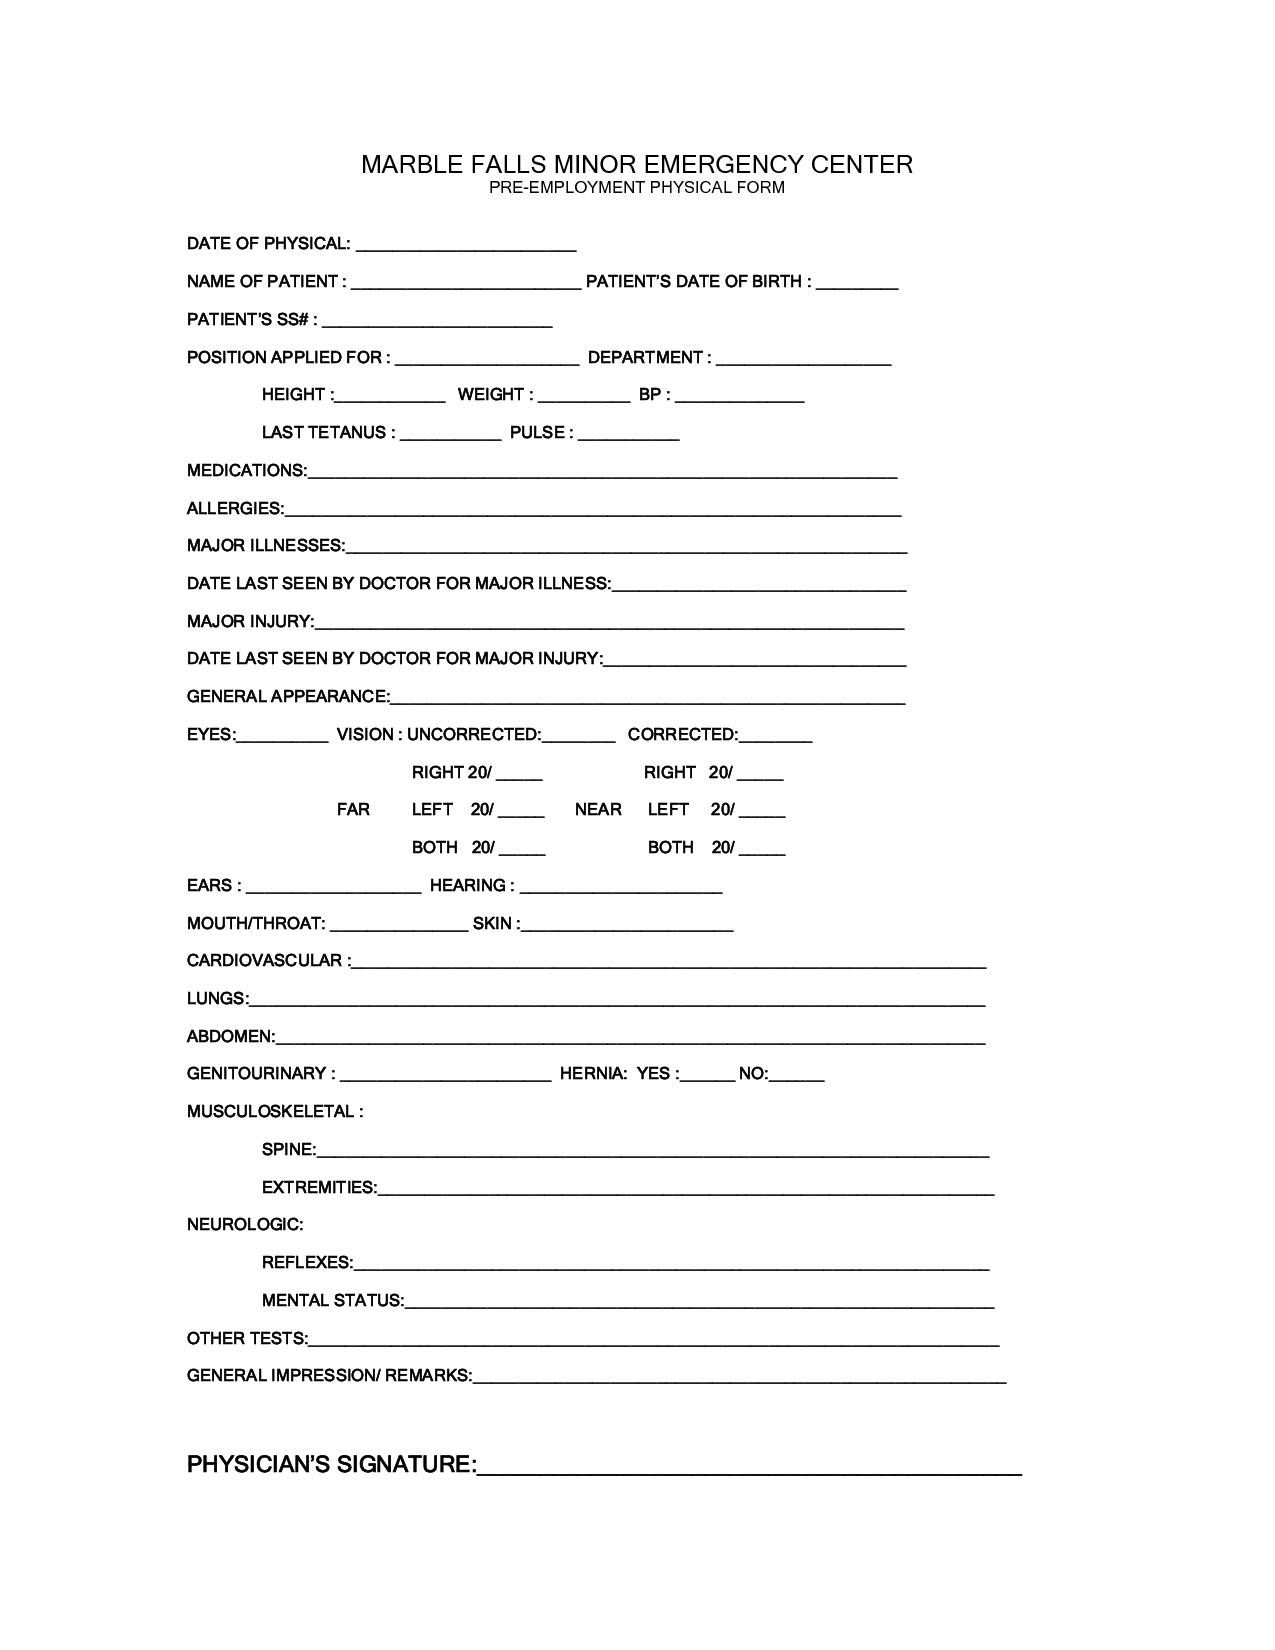 Job Application For Metro Pcs | Professional resumes sample online